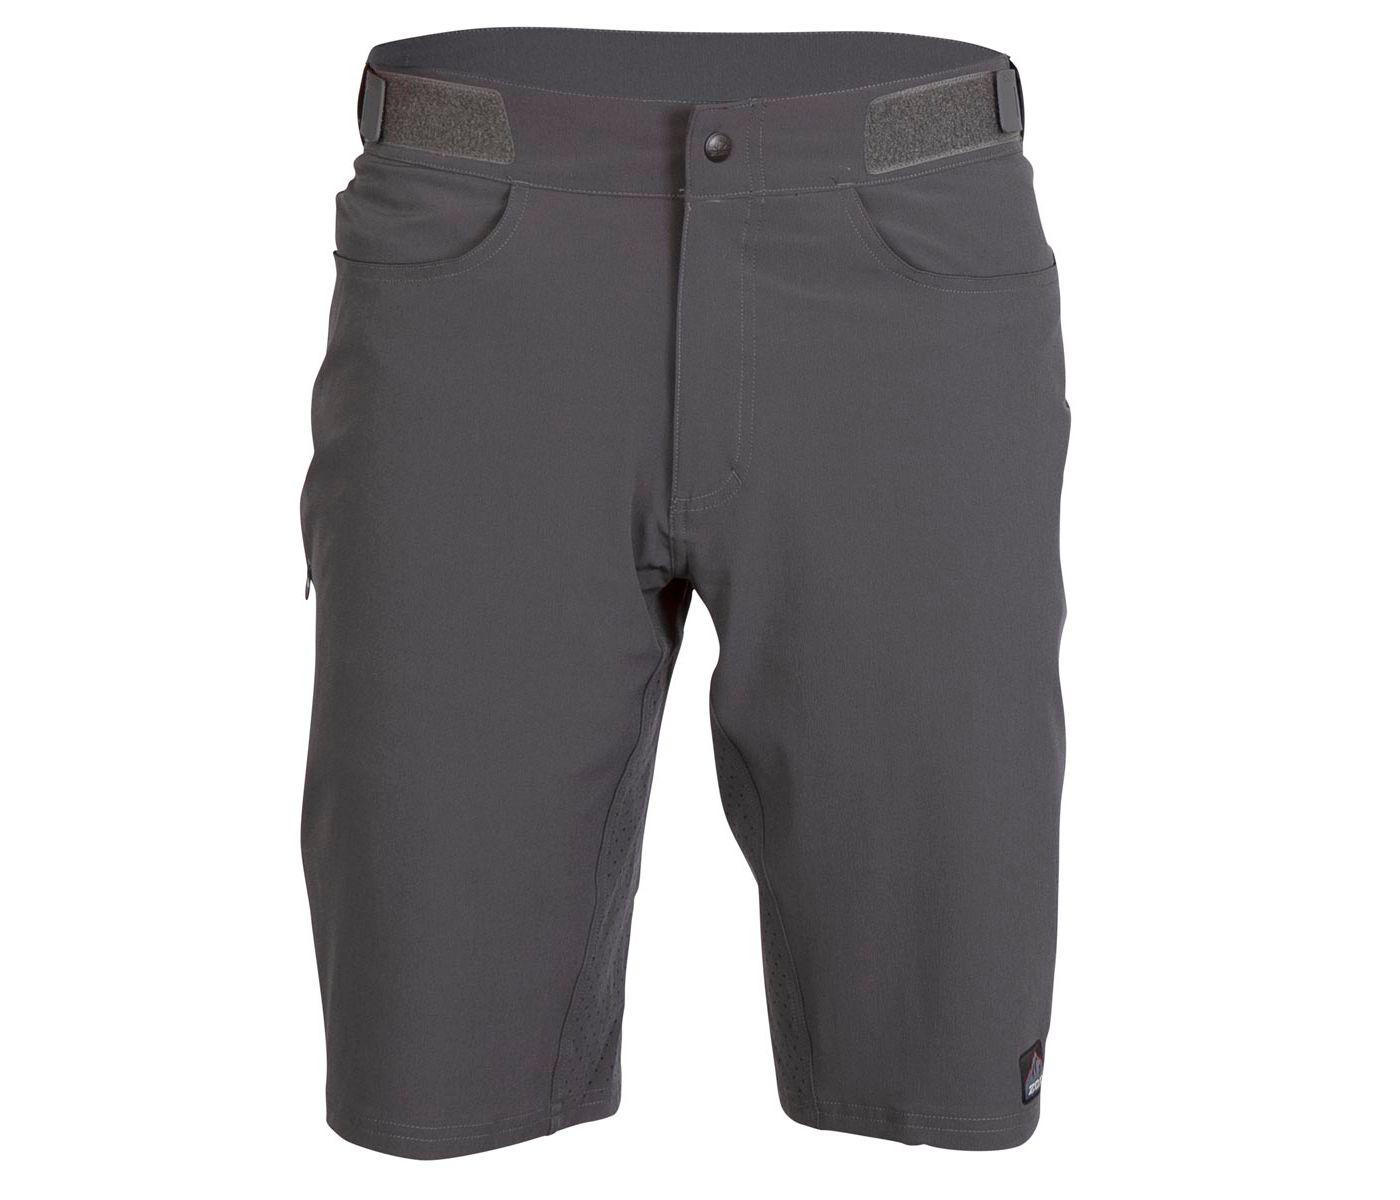 ZOIC Men's Edge Cycling Shorts